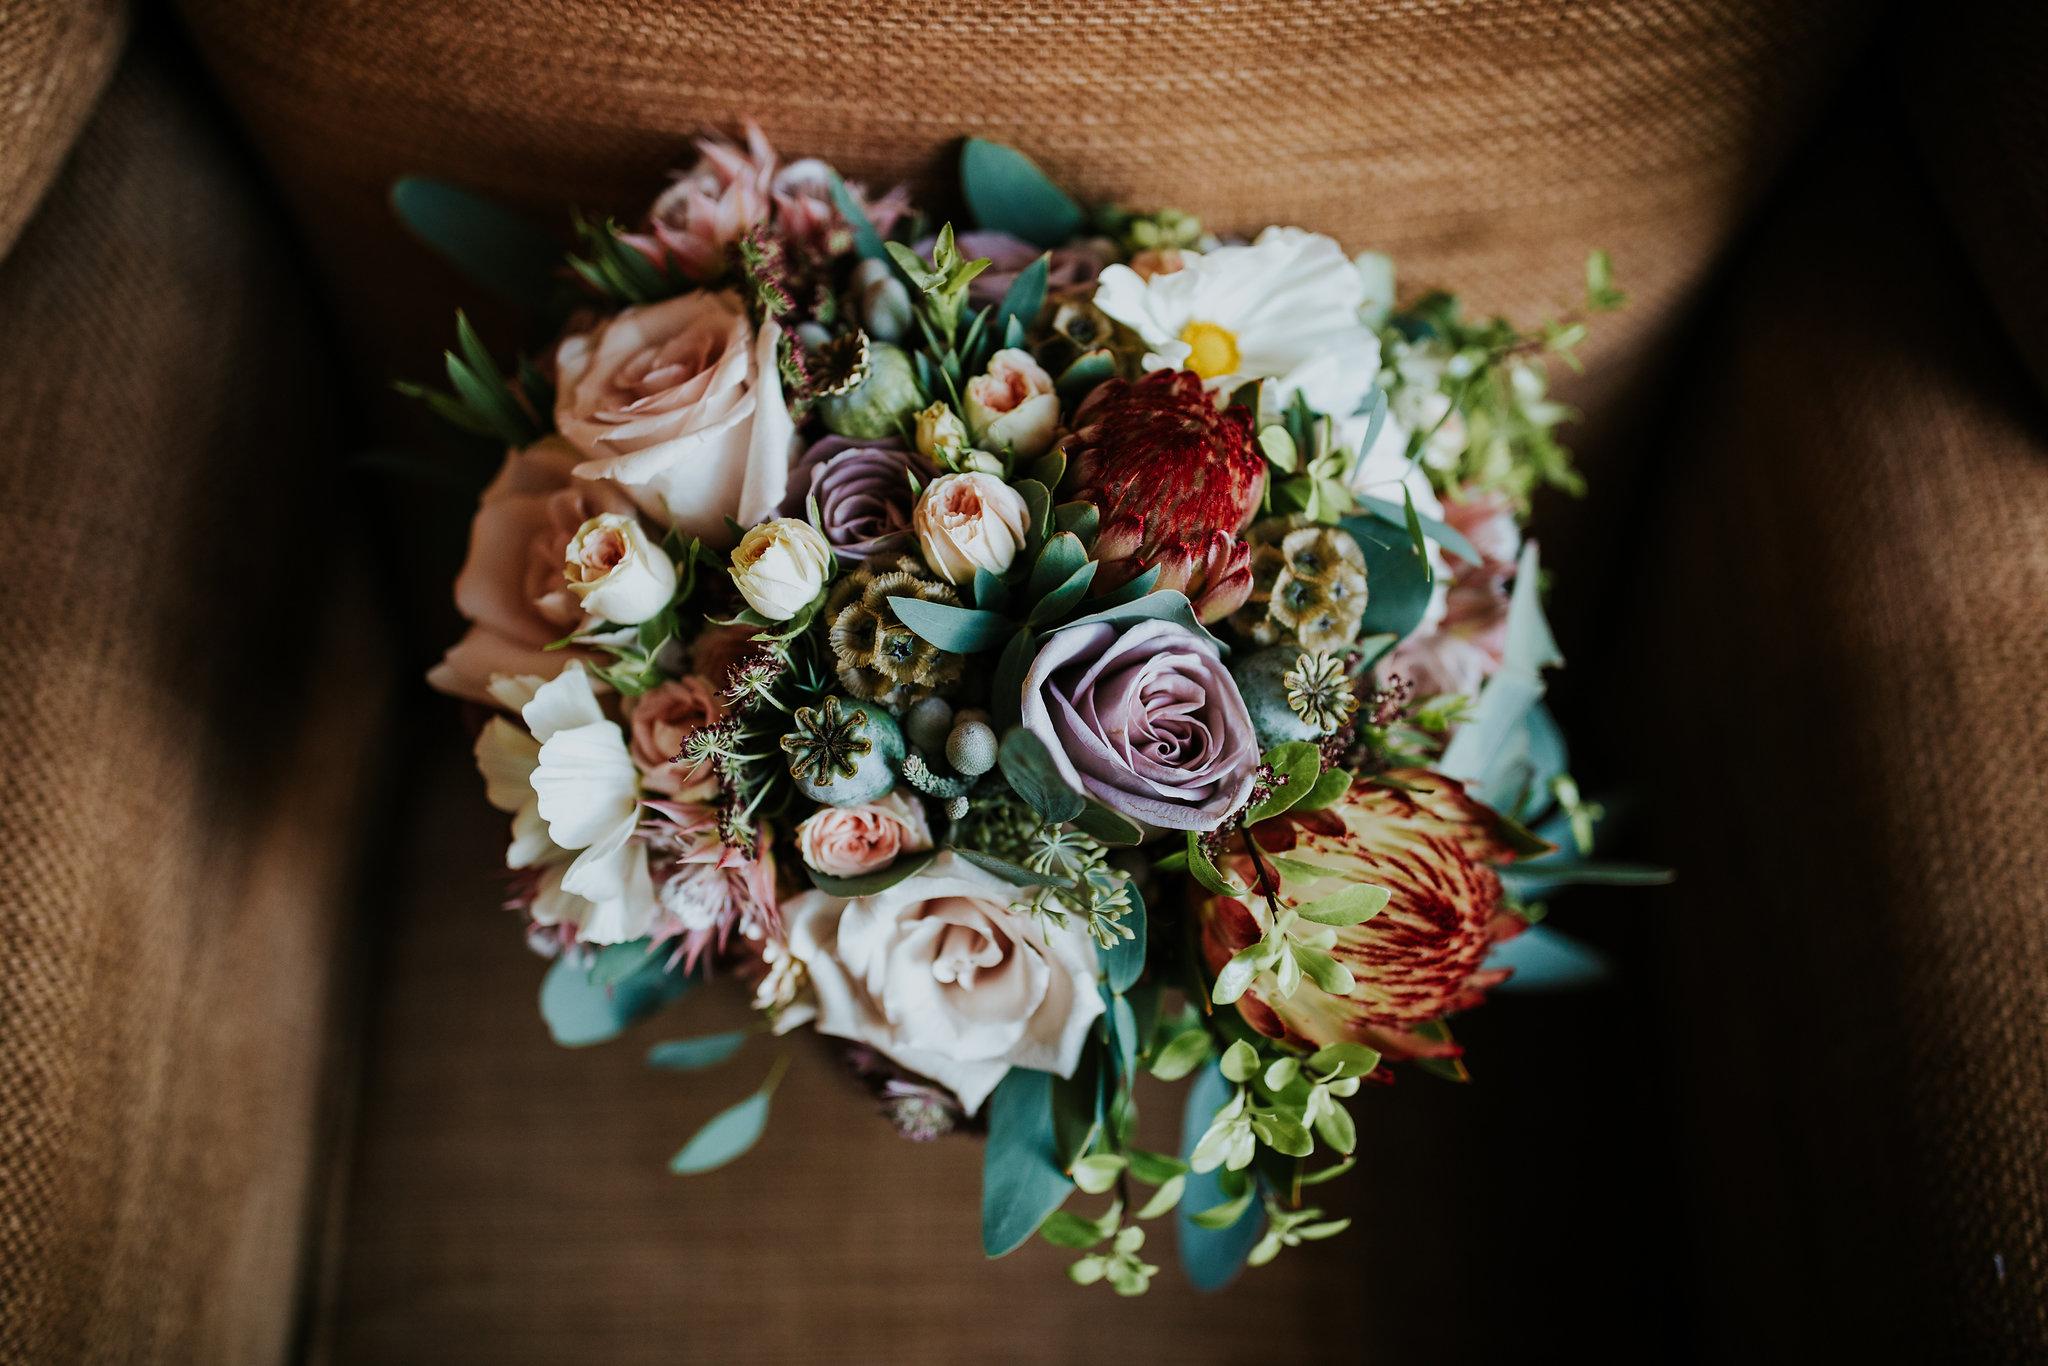 Cottiers wedding lavender and rose wedding florists scotland3.jpg